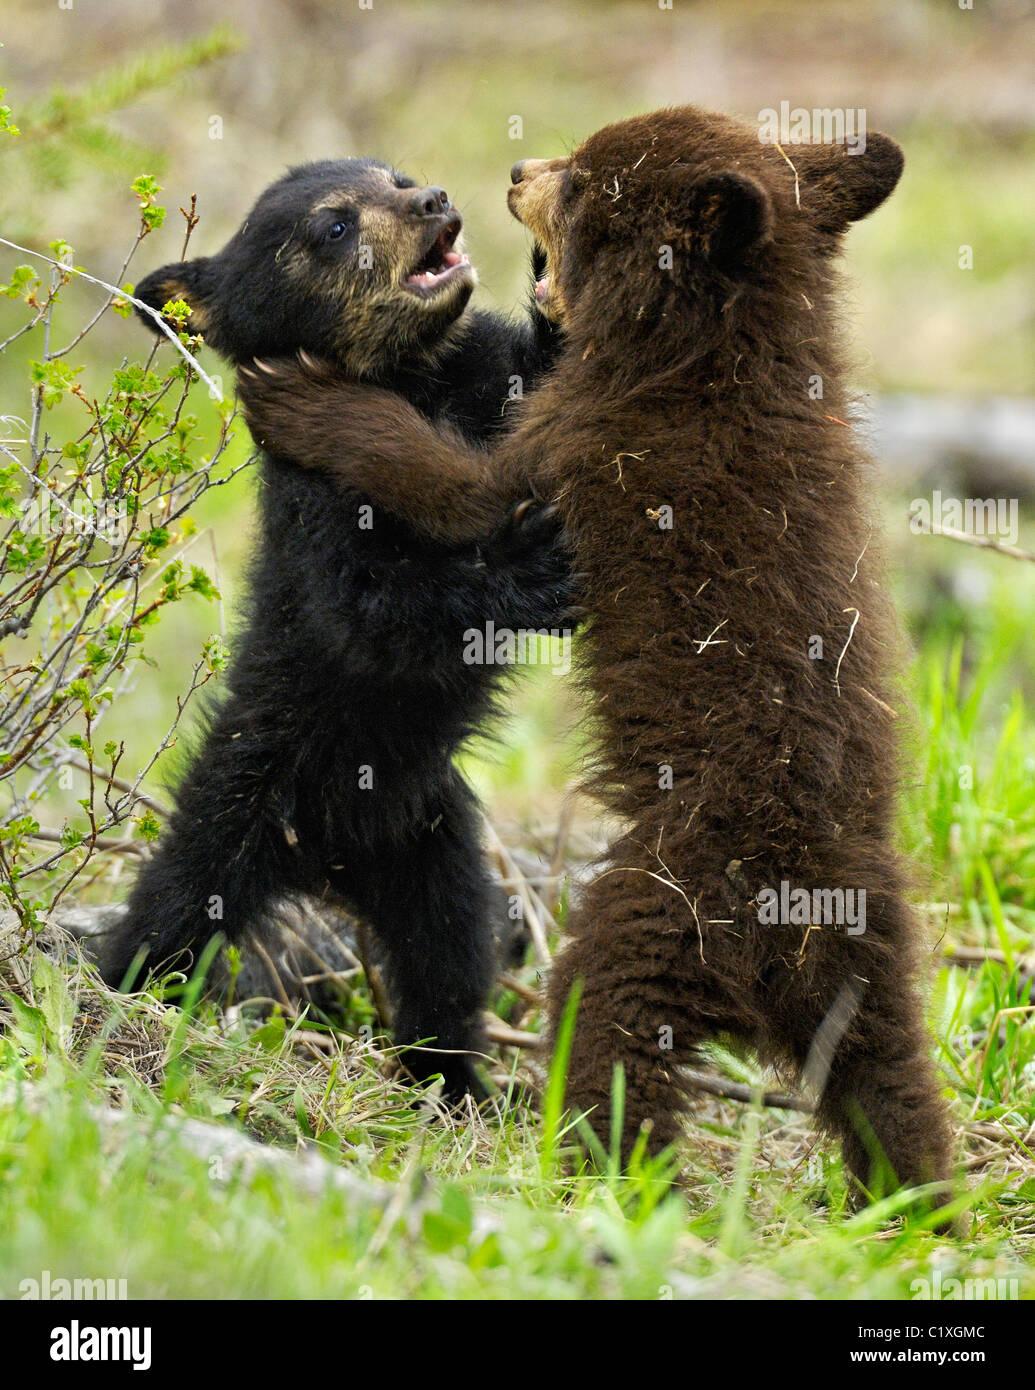 Schwarz und Cinnamon Bear Cubs Ringen. Stockbild